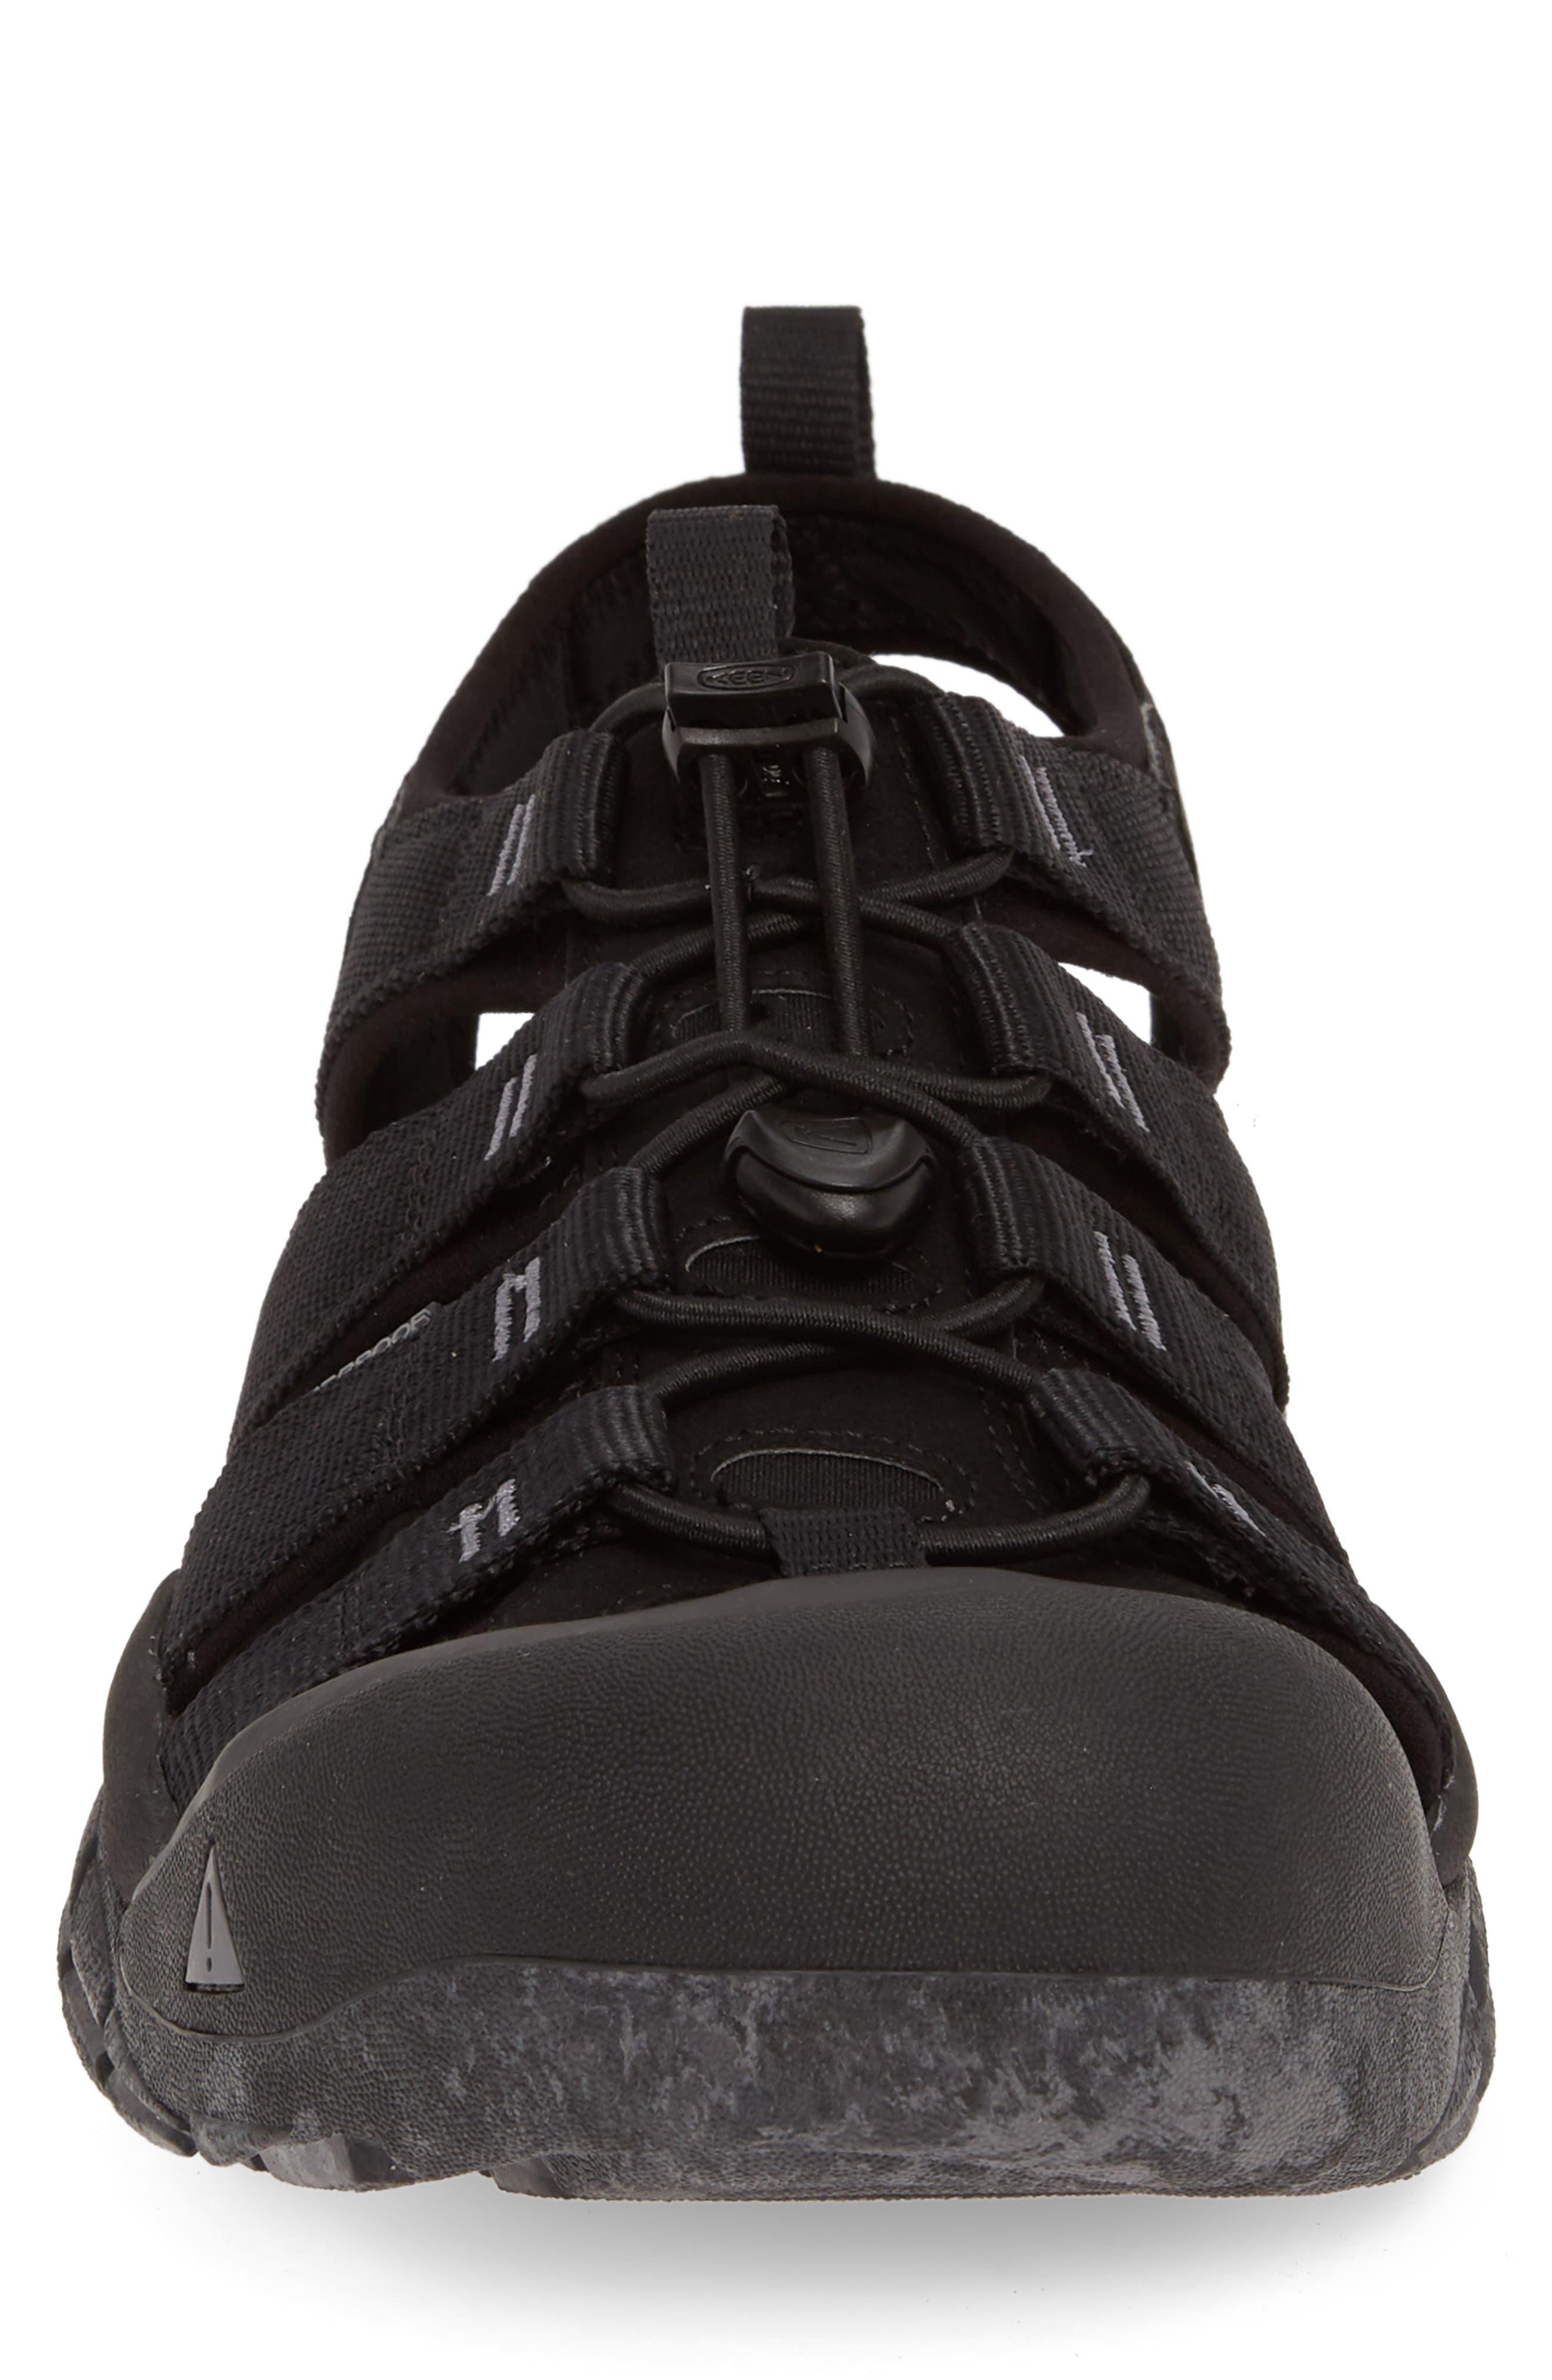 KEEN, 'Newport H2' Sandal, Alternate thumbnail 4, color, BLACK/ SWIRL OUTSOLE